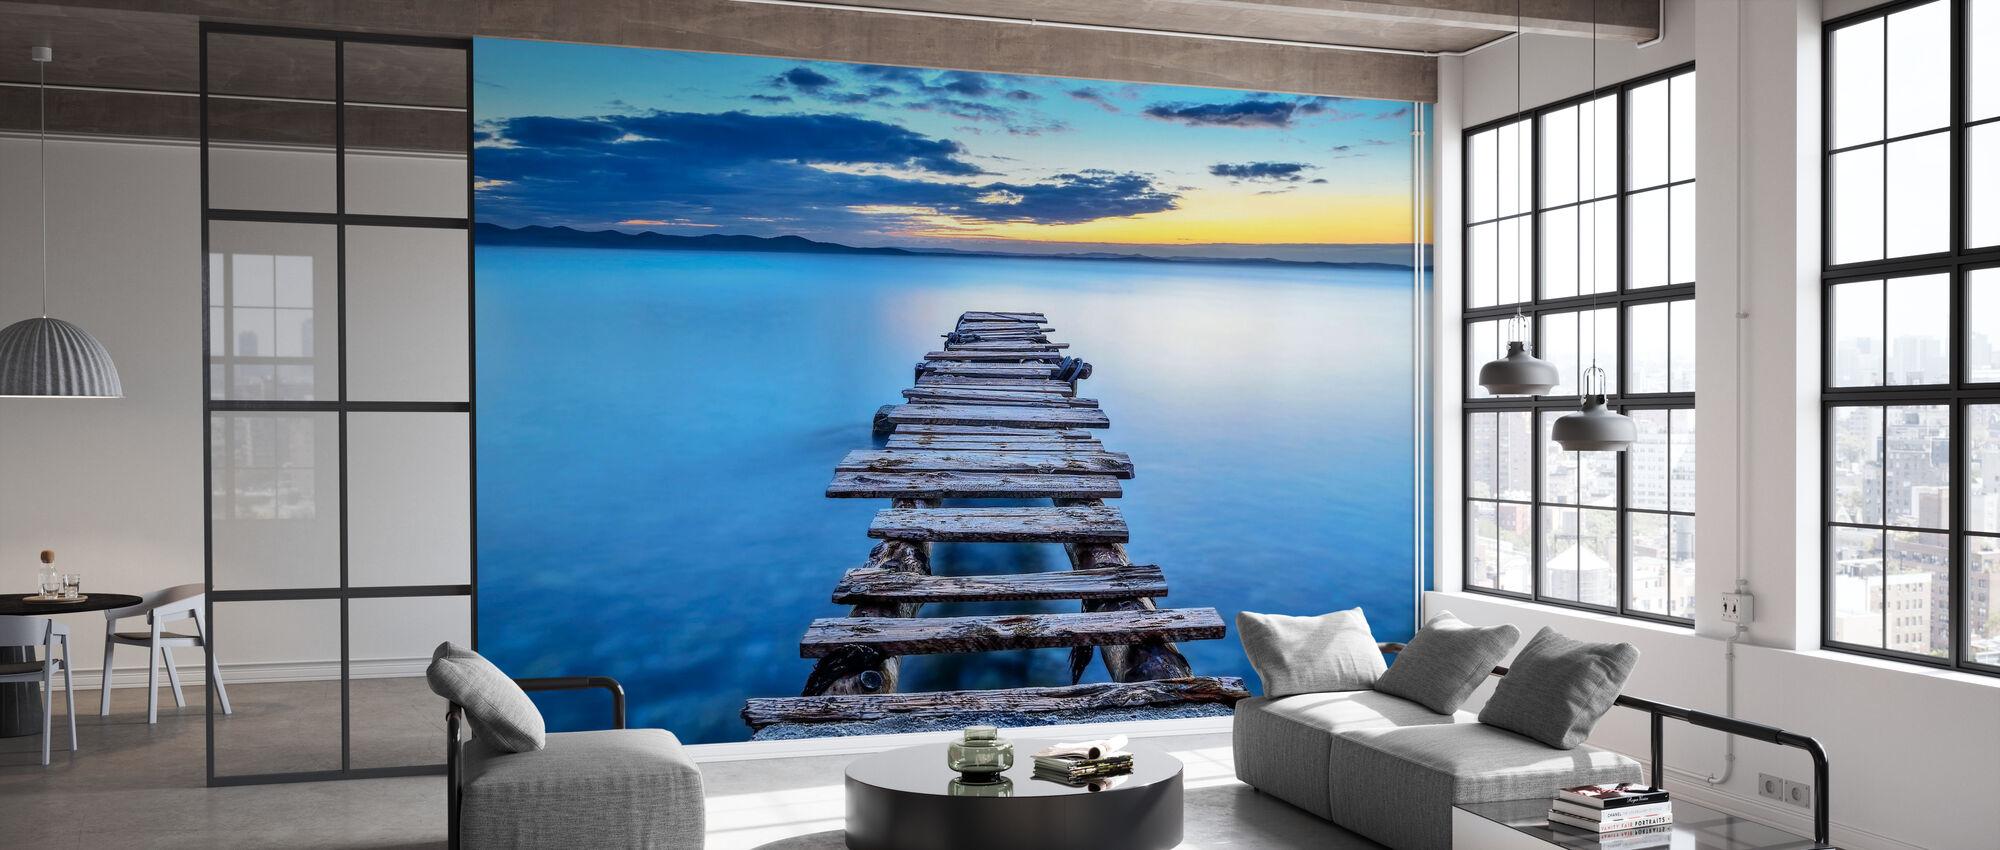 Pier - Wallpaper - Office